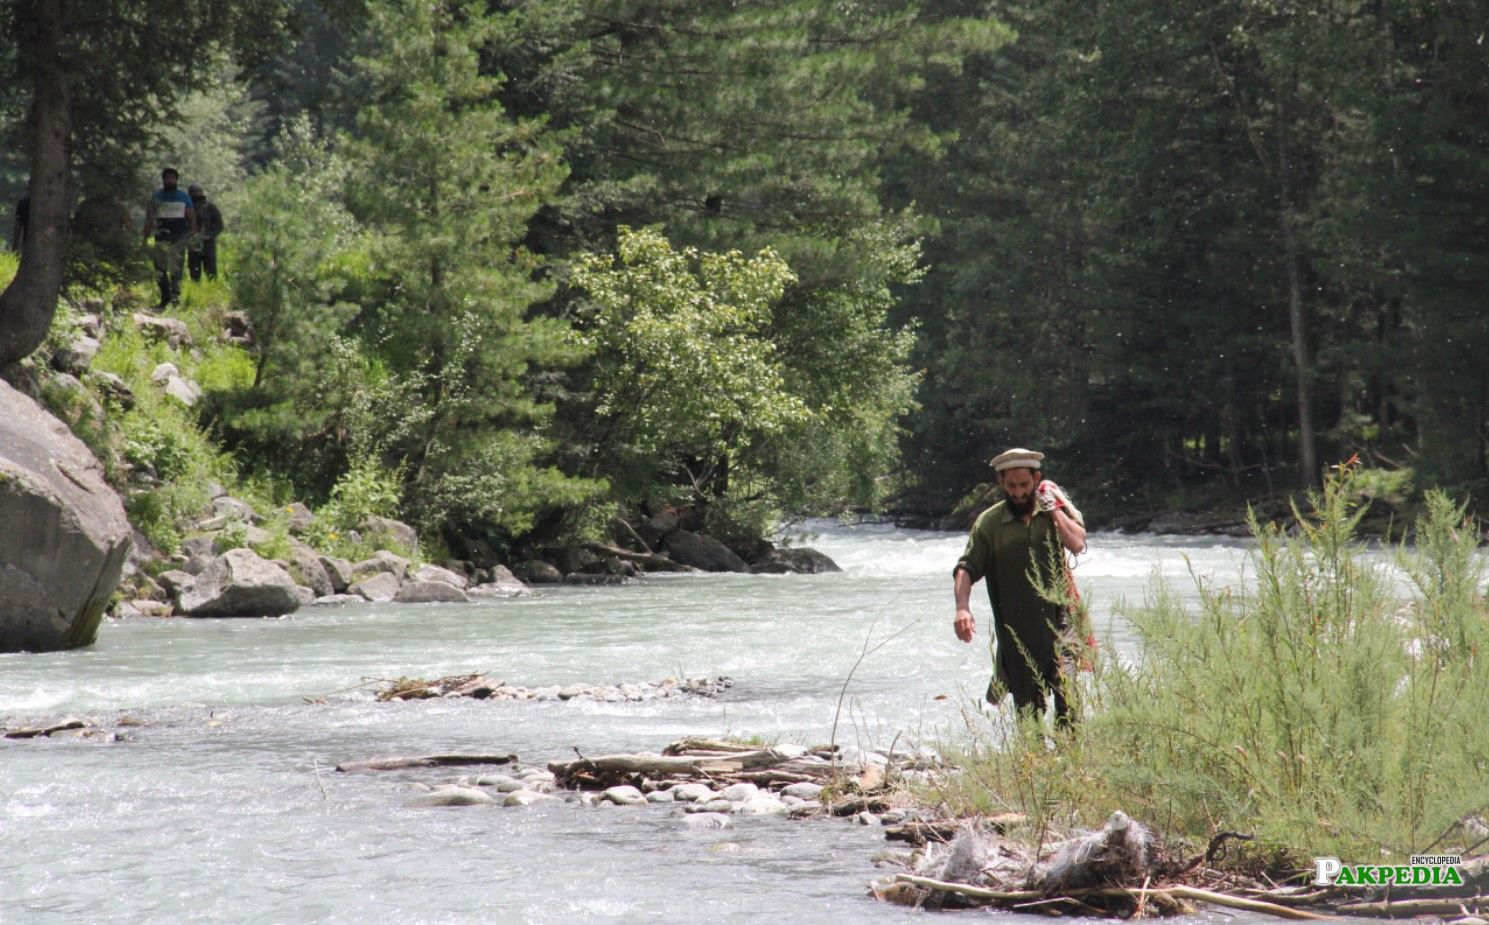 Trout fishing in River Panjkora